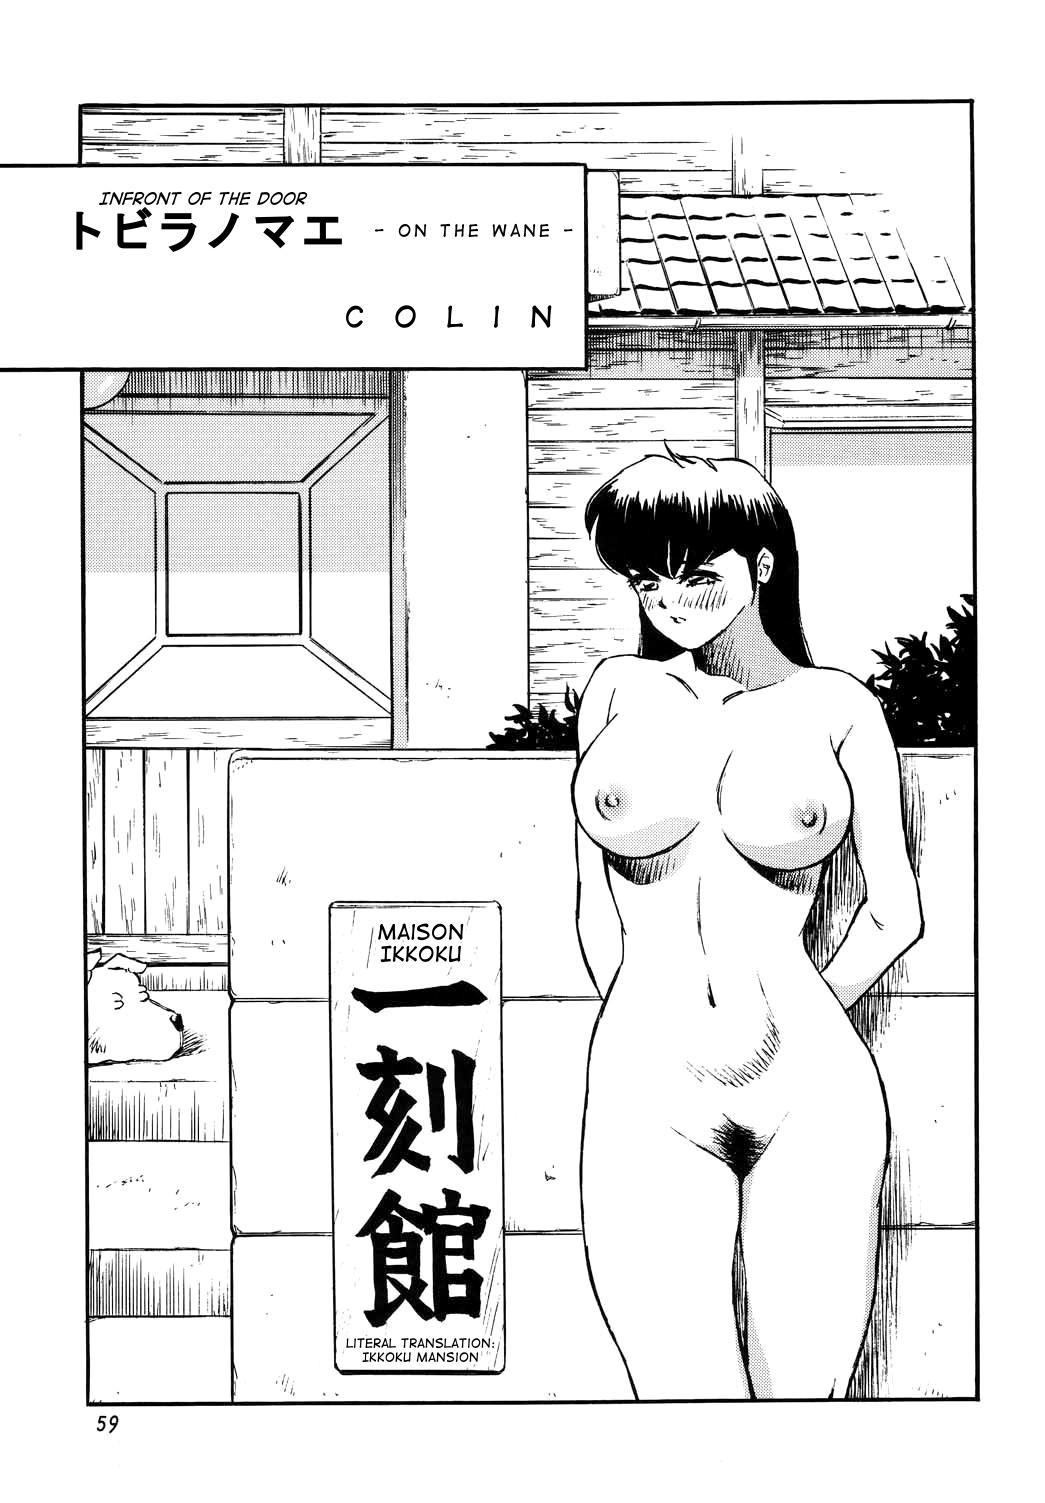 (C64) [Rippadou (COLIN)] Tobira no Mae -on the wane- | Infront of the Door (ROUTE 106) (Maison Ikkoku) [English] [q91] 0